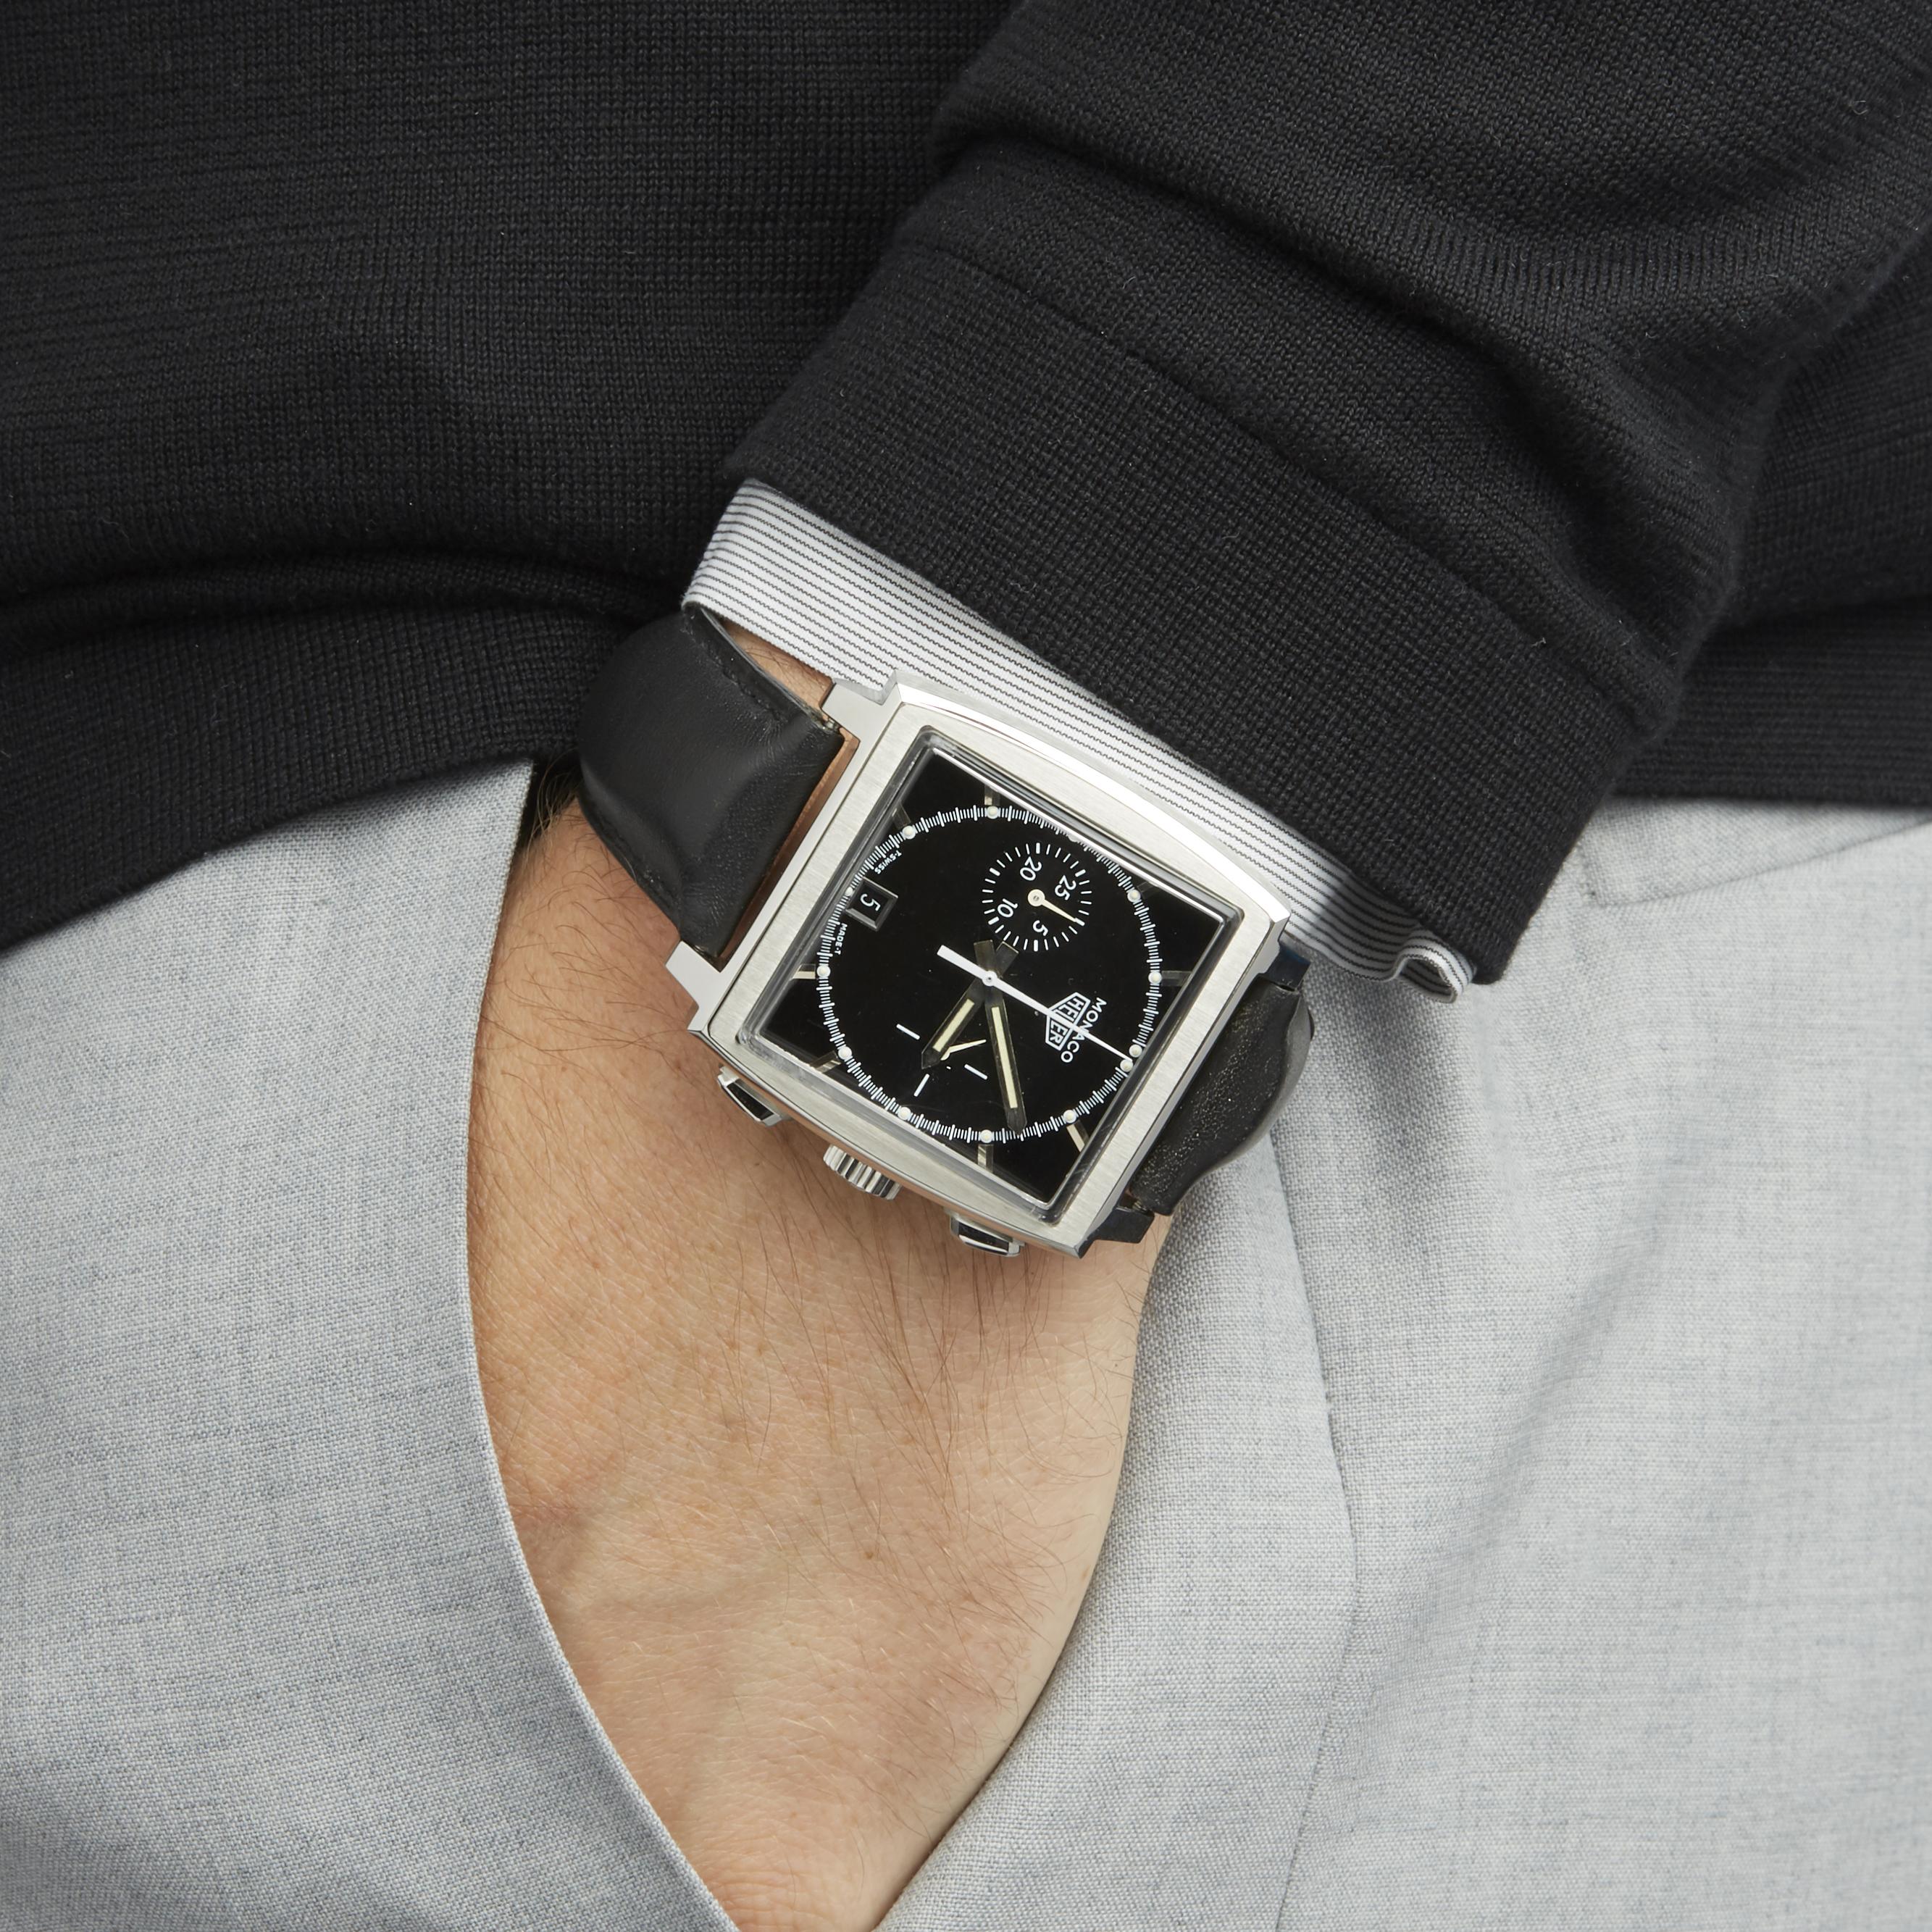 Tag Heuer Monaco Stainless Steel Watch Cs2110 Com1721 Ebay Space Leather